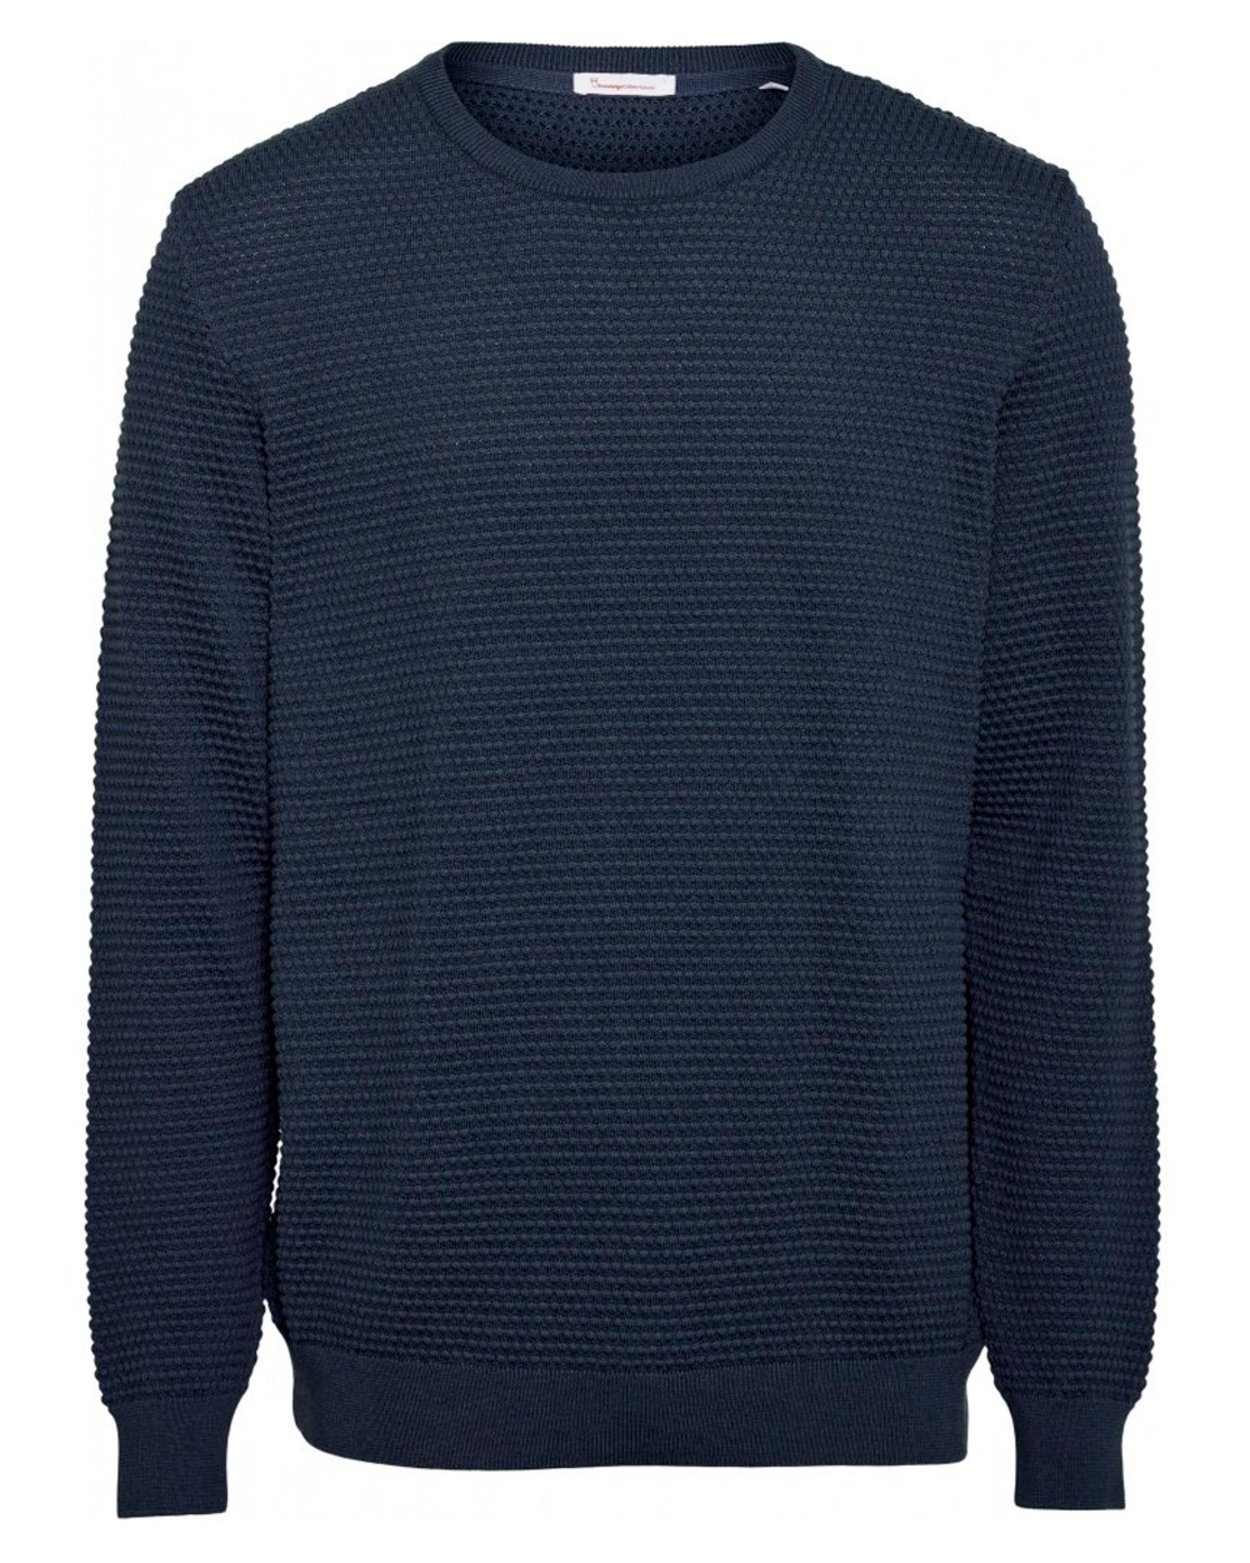 Field Sailor Knit Sweater